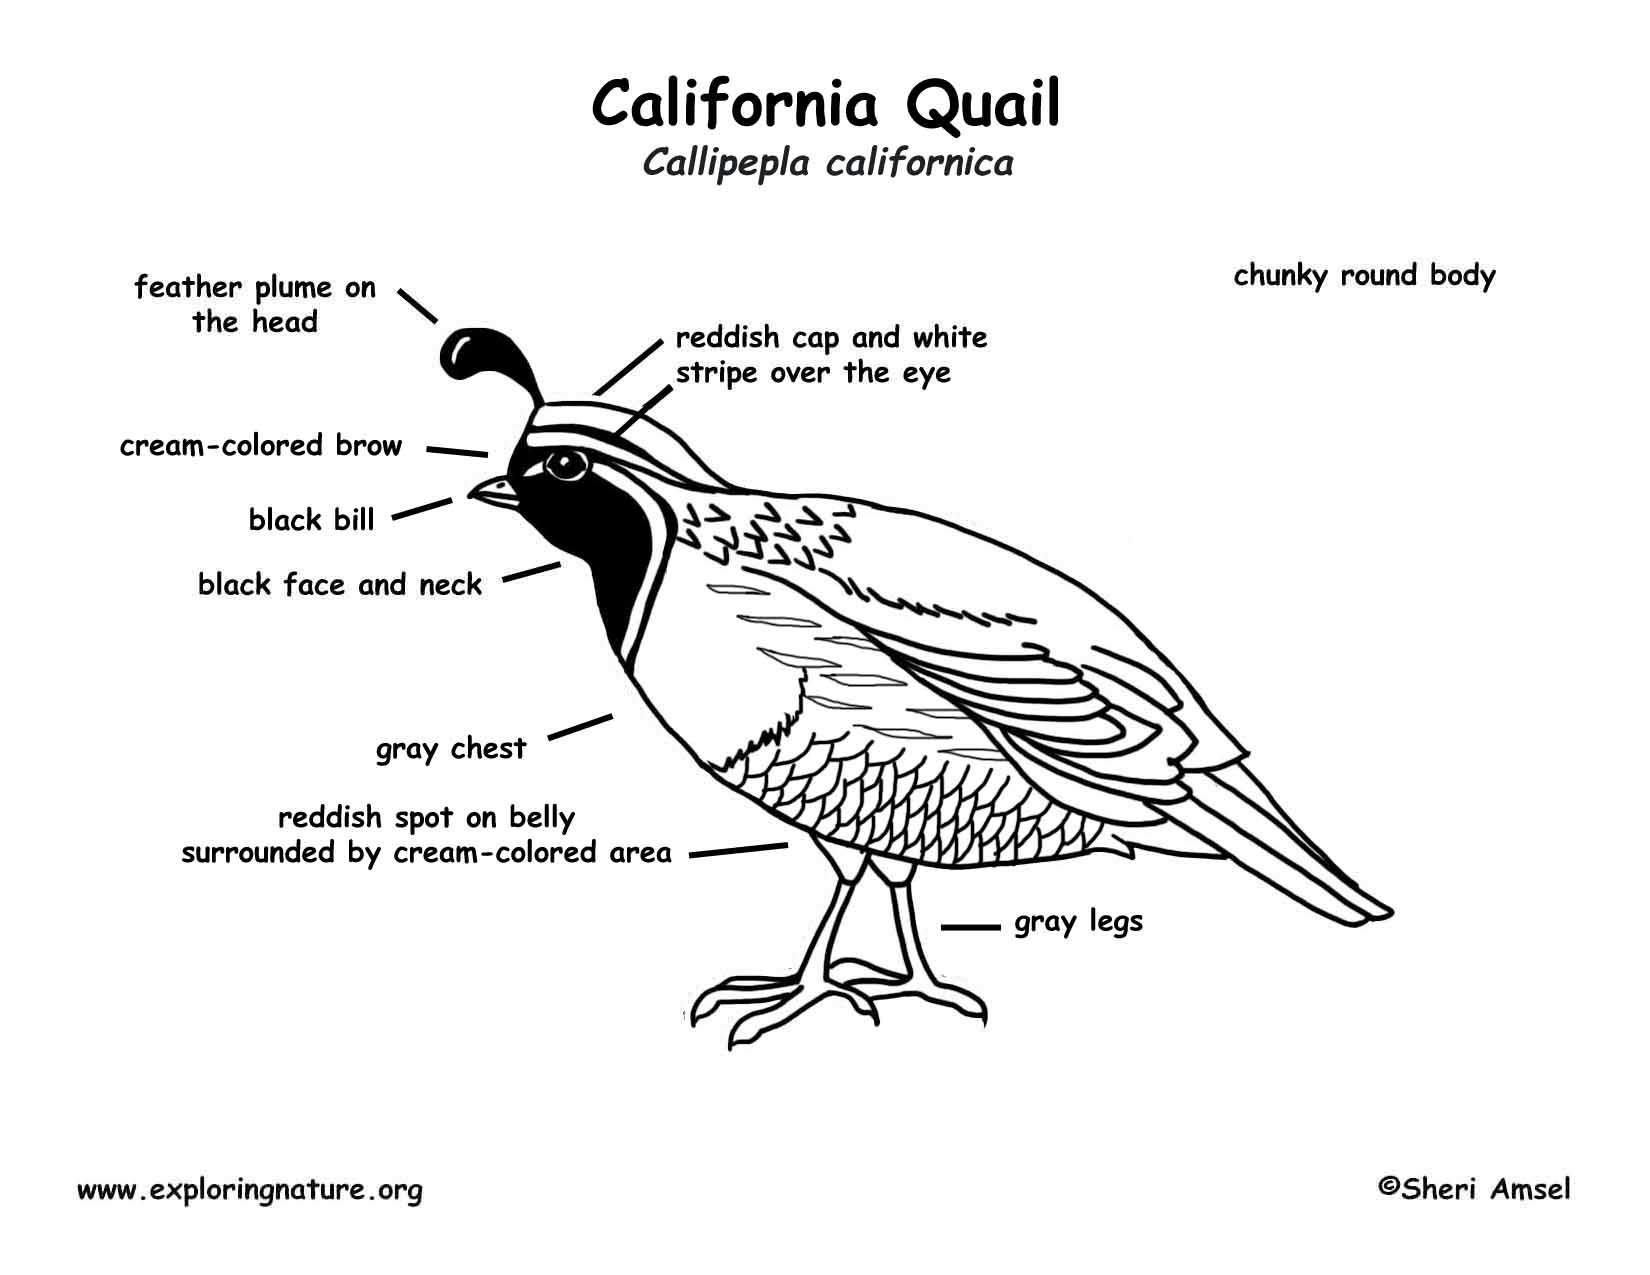 Quail California